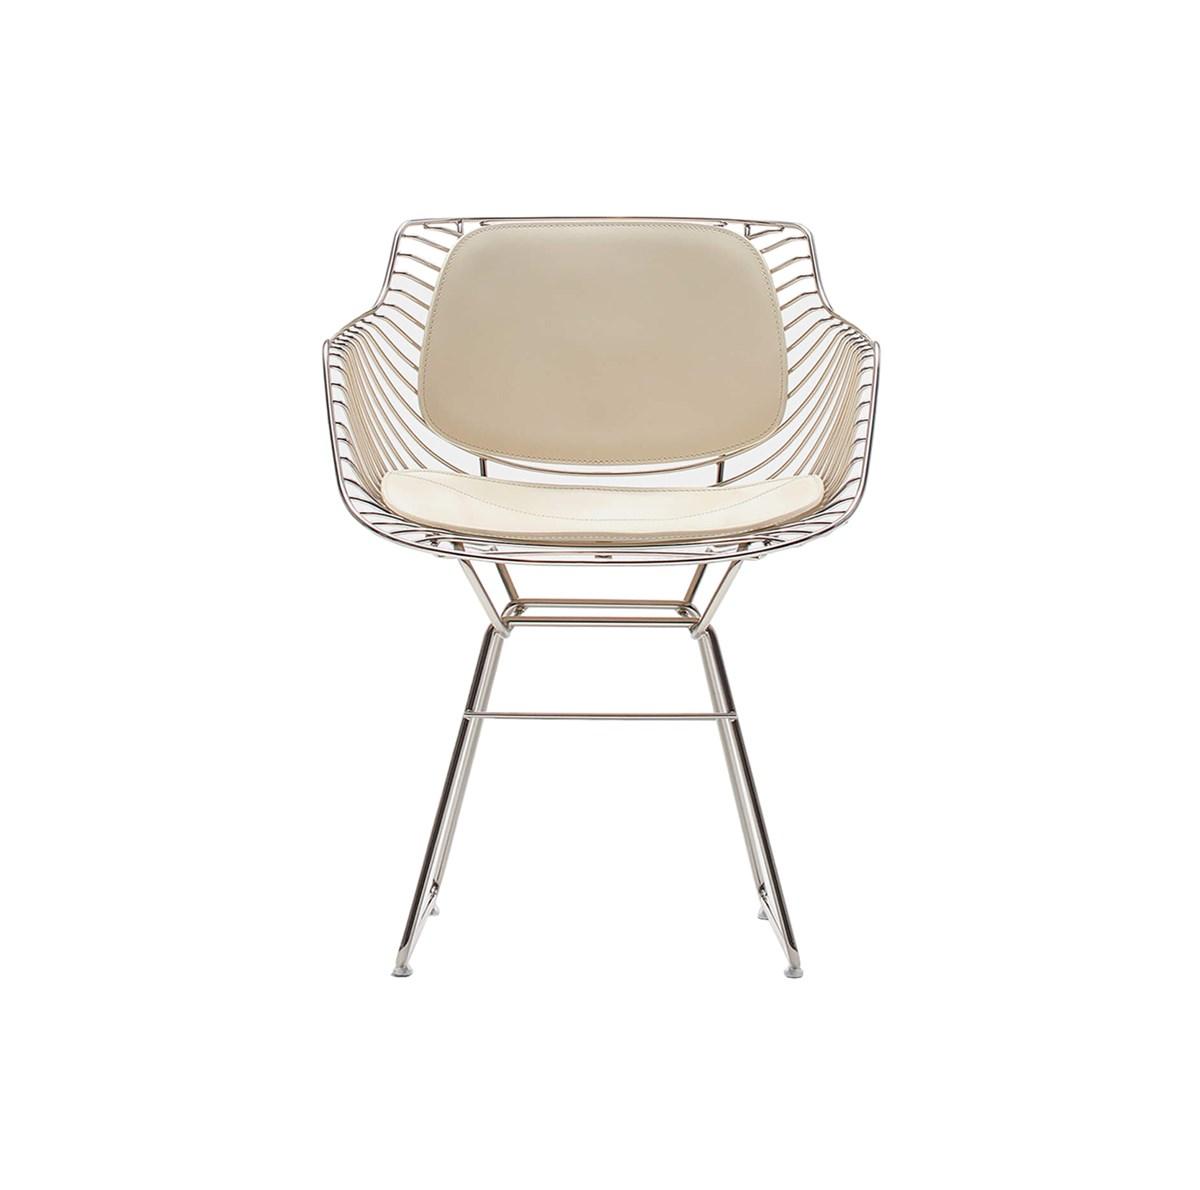 MDF-Italia-Jean-Marie-Massaud-Flow-Filo-Chair-Matisse-1